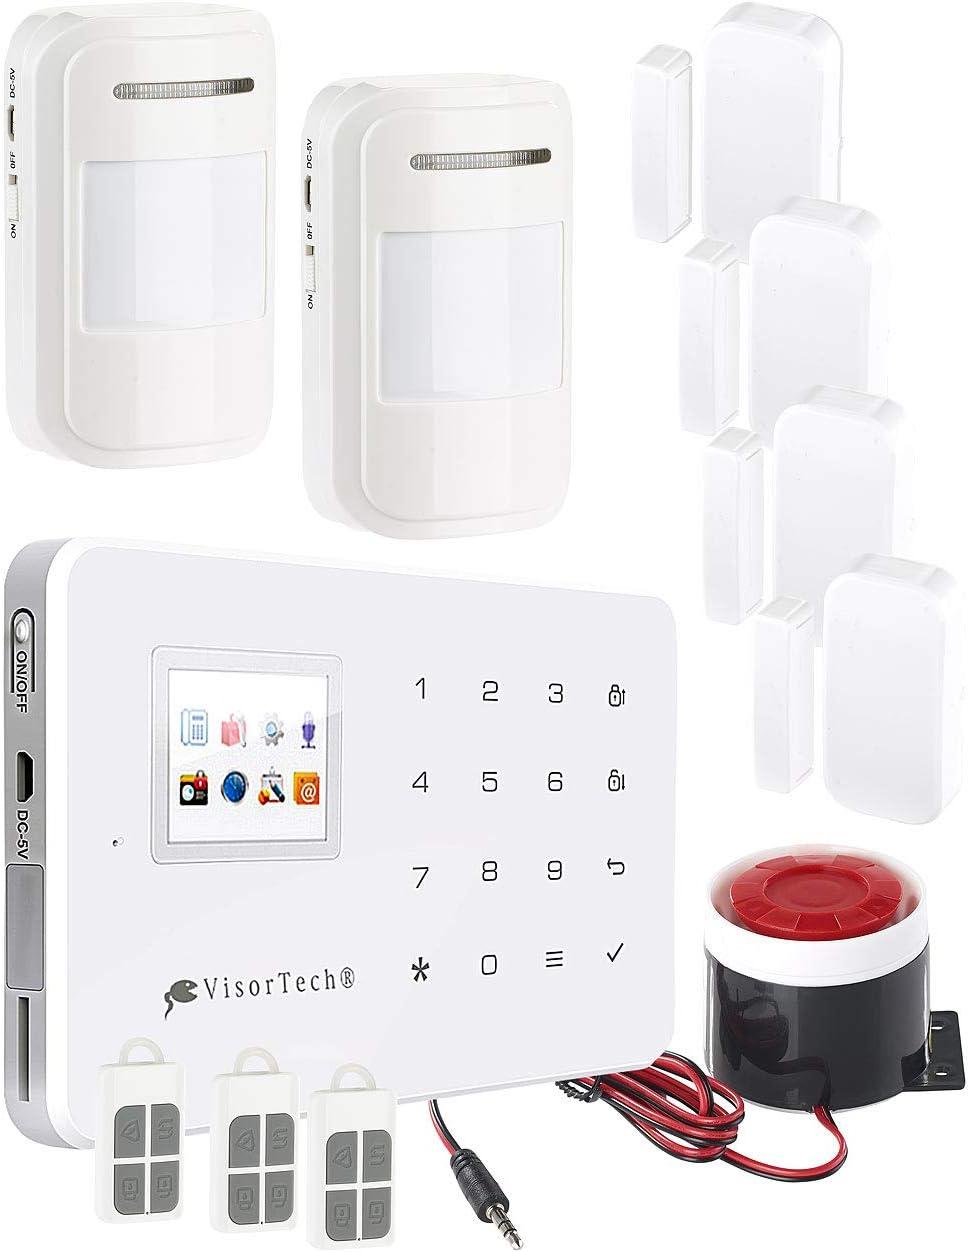 GPRS WiFi Intelligenter Videoalarm mit 2,4 TFT Farbbildschirm//Funkfernbedienung EU GSM Funk-Alarmanlage Set T/ürsensor PIR Sensor 433 MHz Wireless GSM